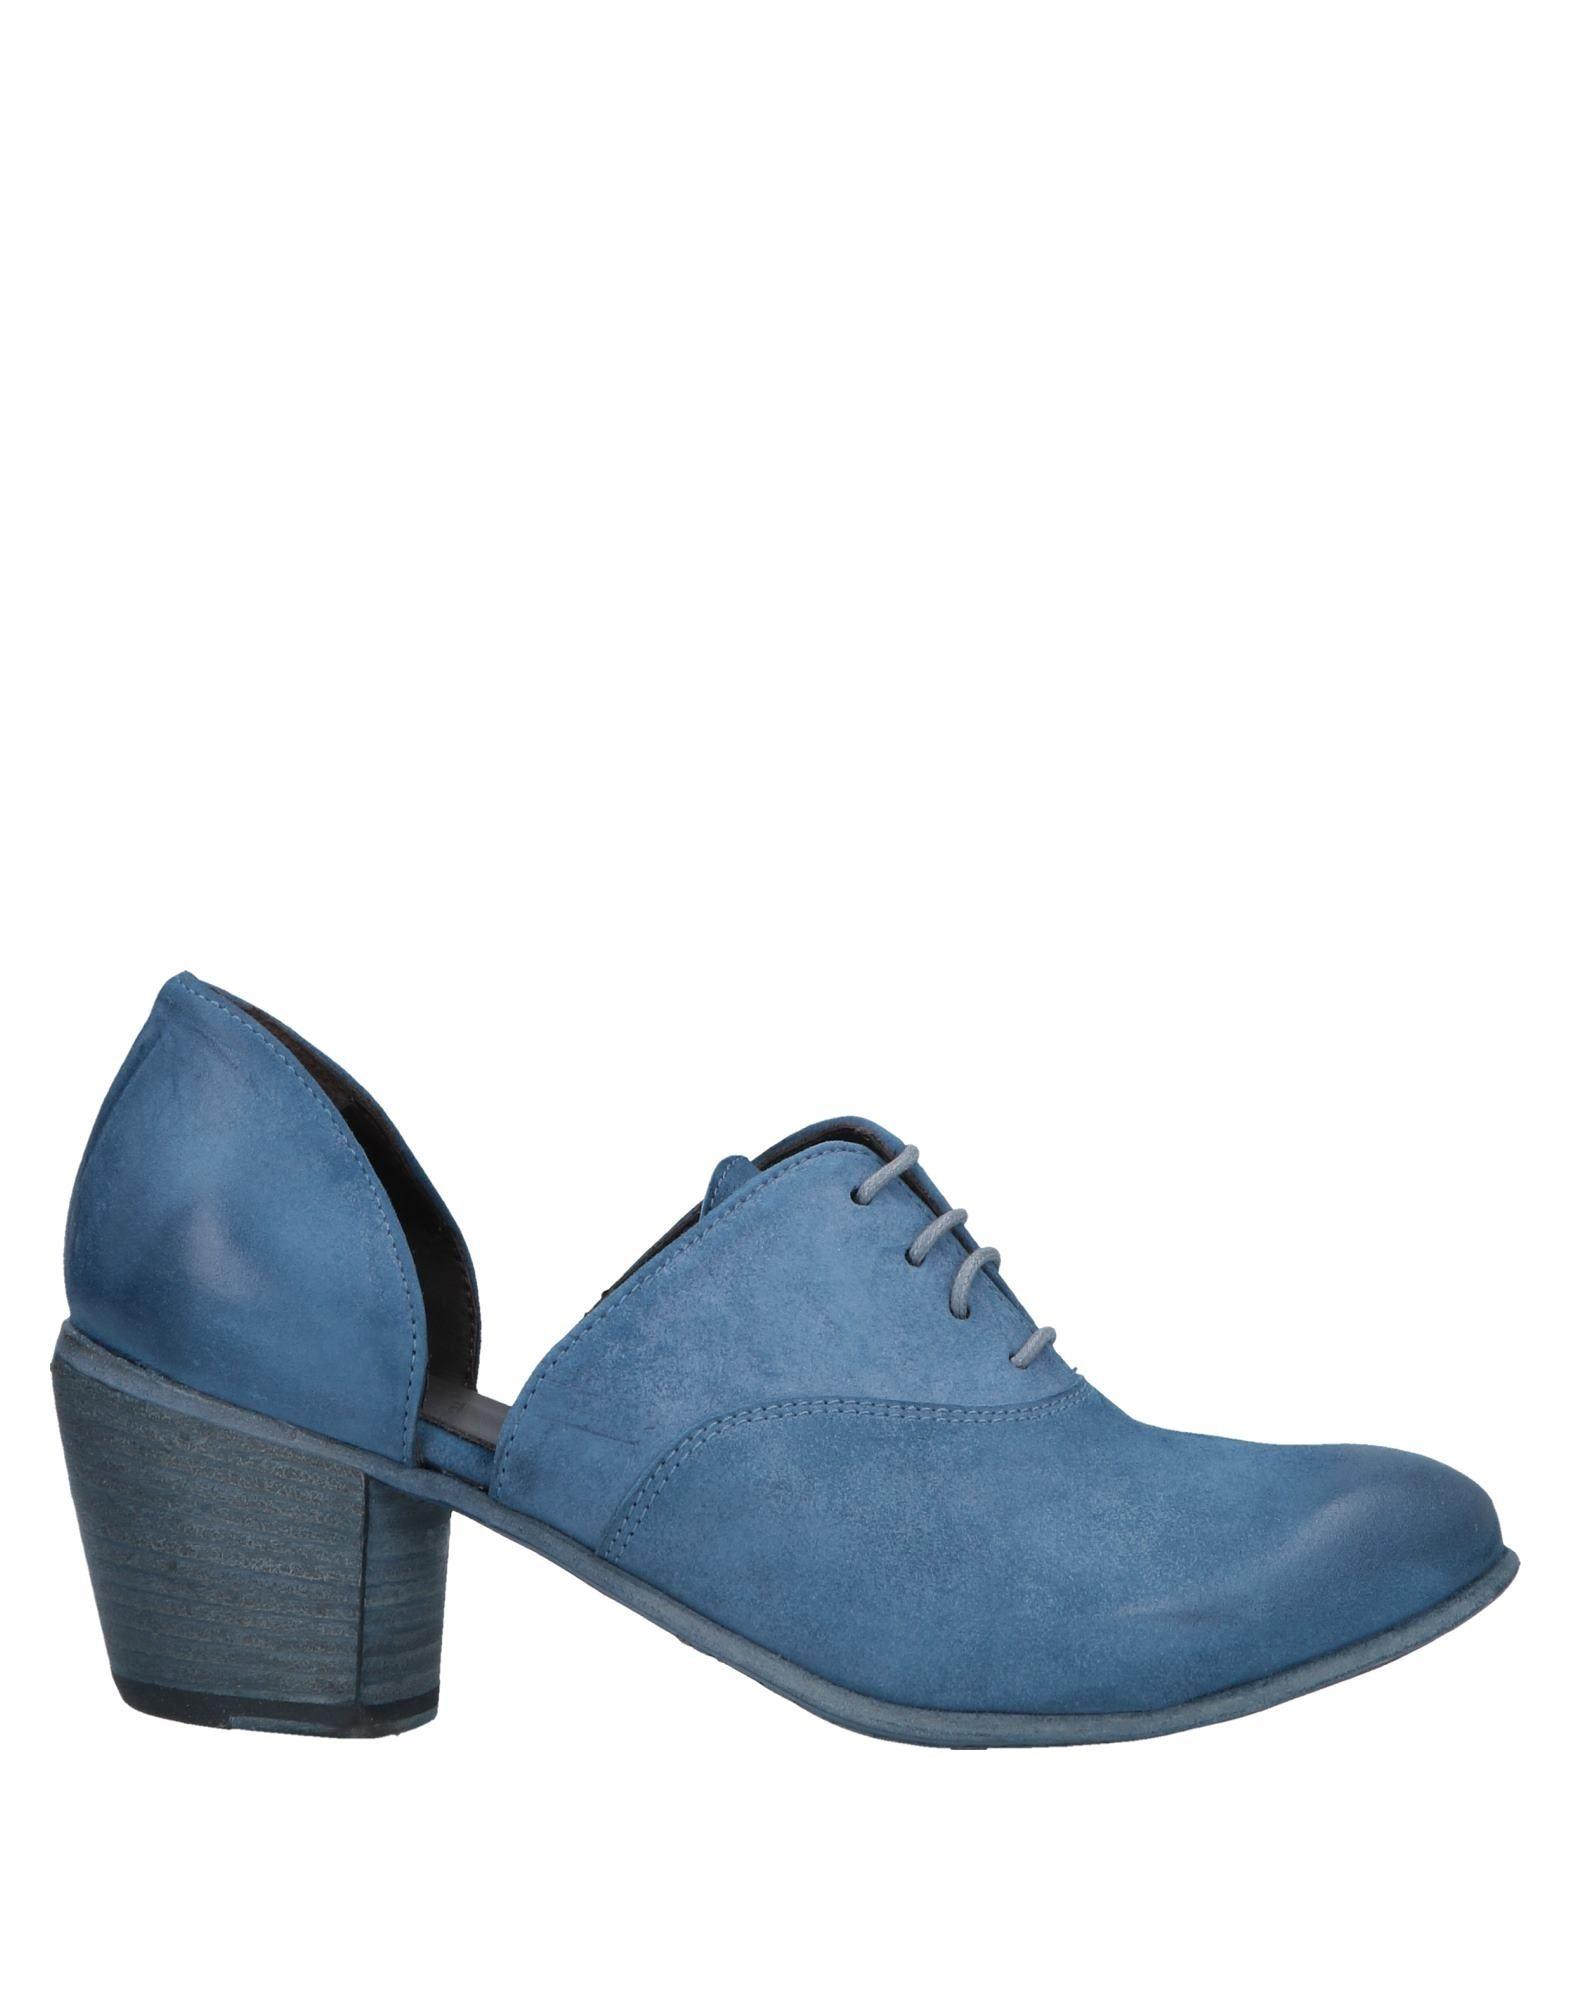 OPEN CLOSED SHOES Обувь на шнурках open closed shoes мокасины